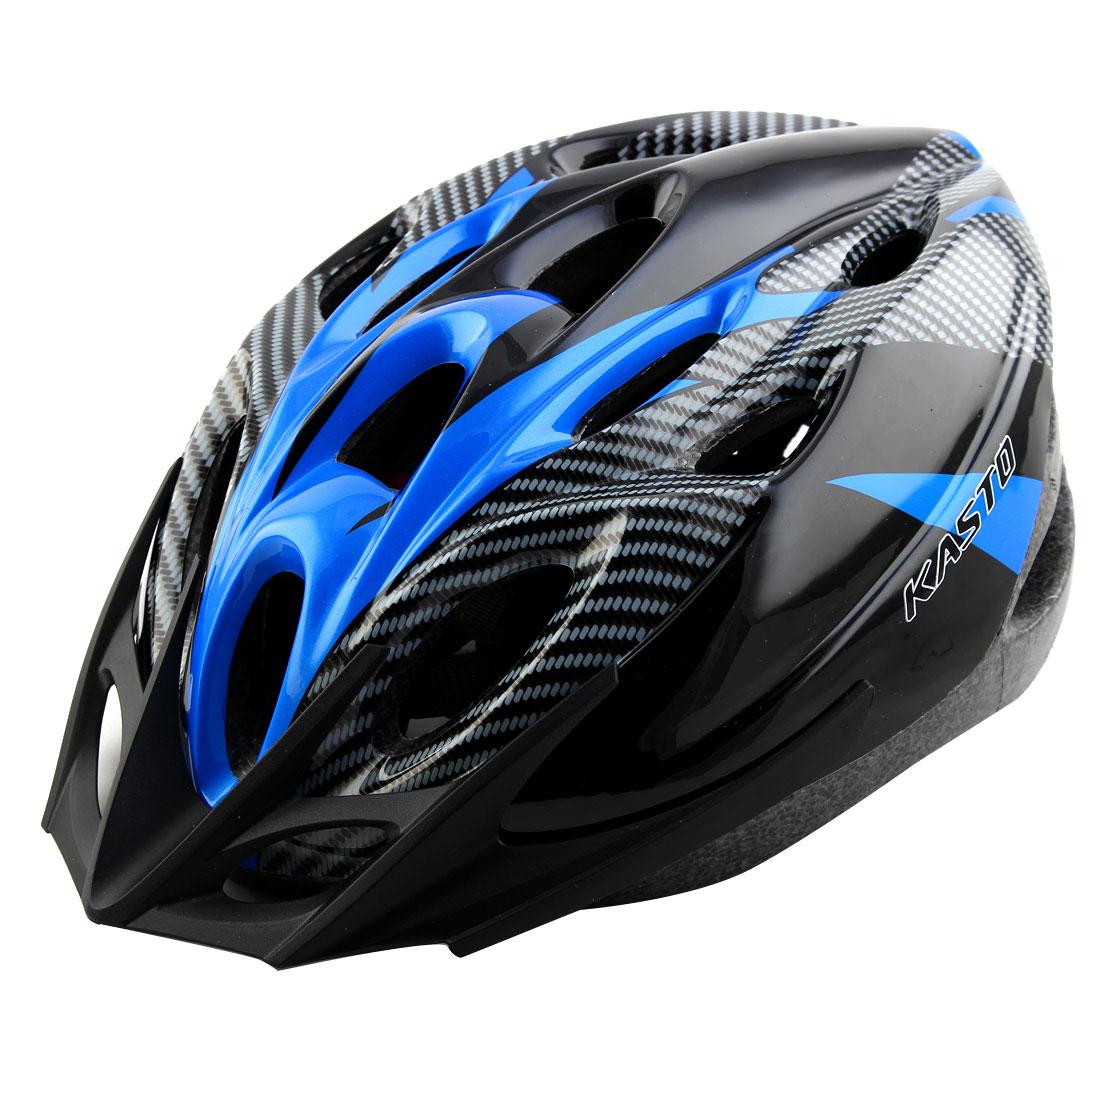 Adult 18 Holes Removable Visor Outdoor Sports Cap Portable Hat Adjustable Cycling Biking Helmet Dark Blue